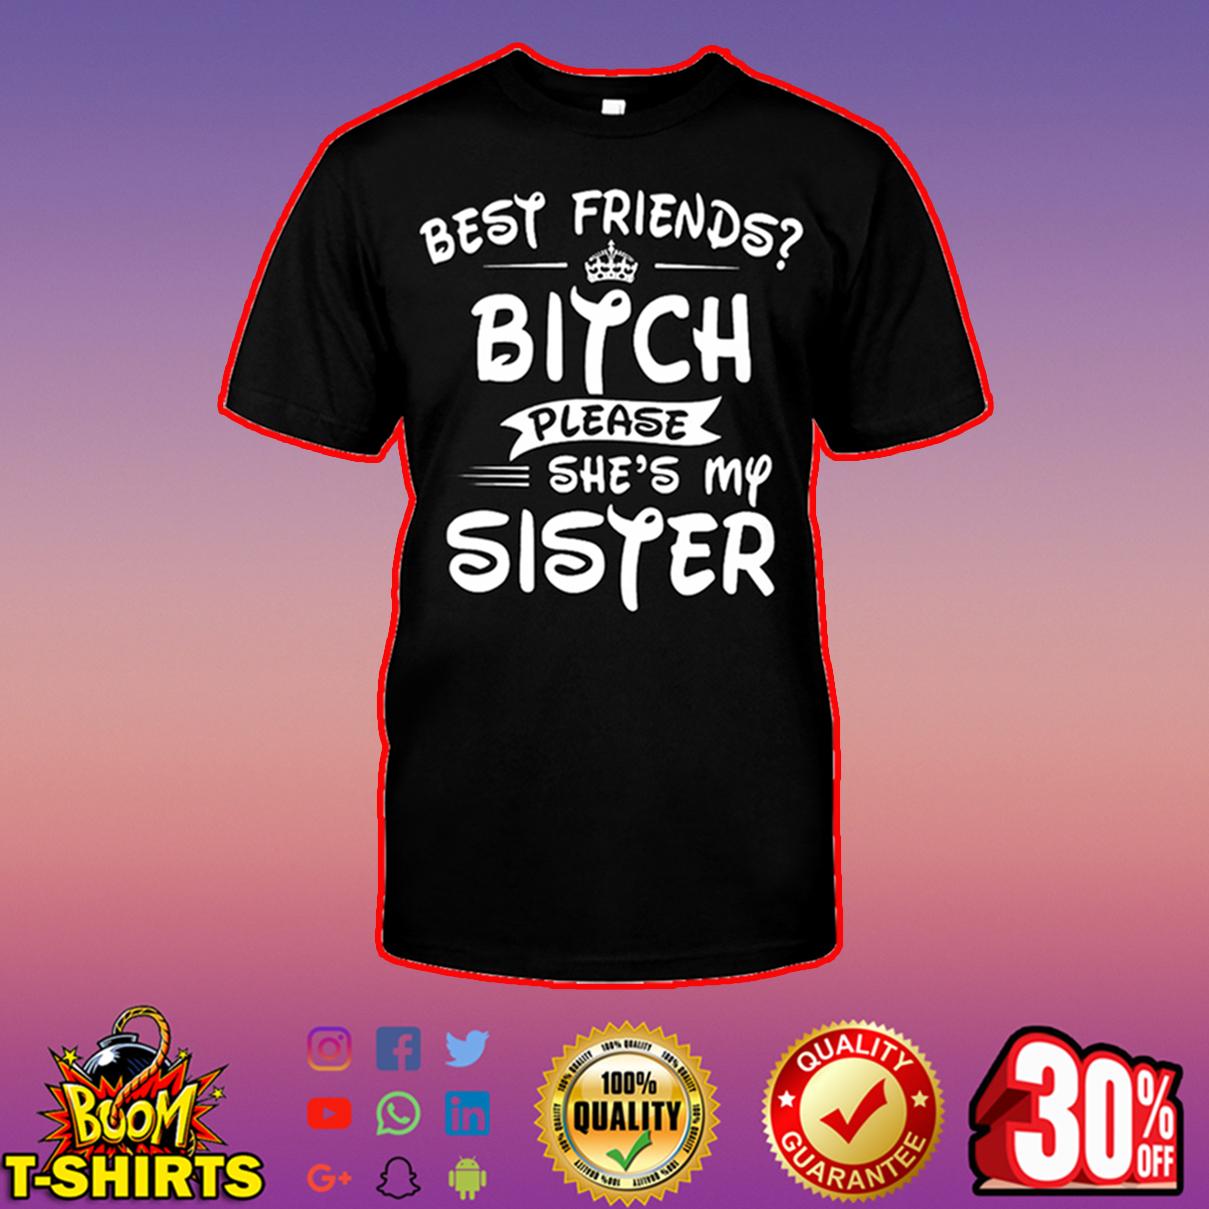 Best friends bitch please she's my sister shirt